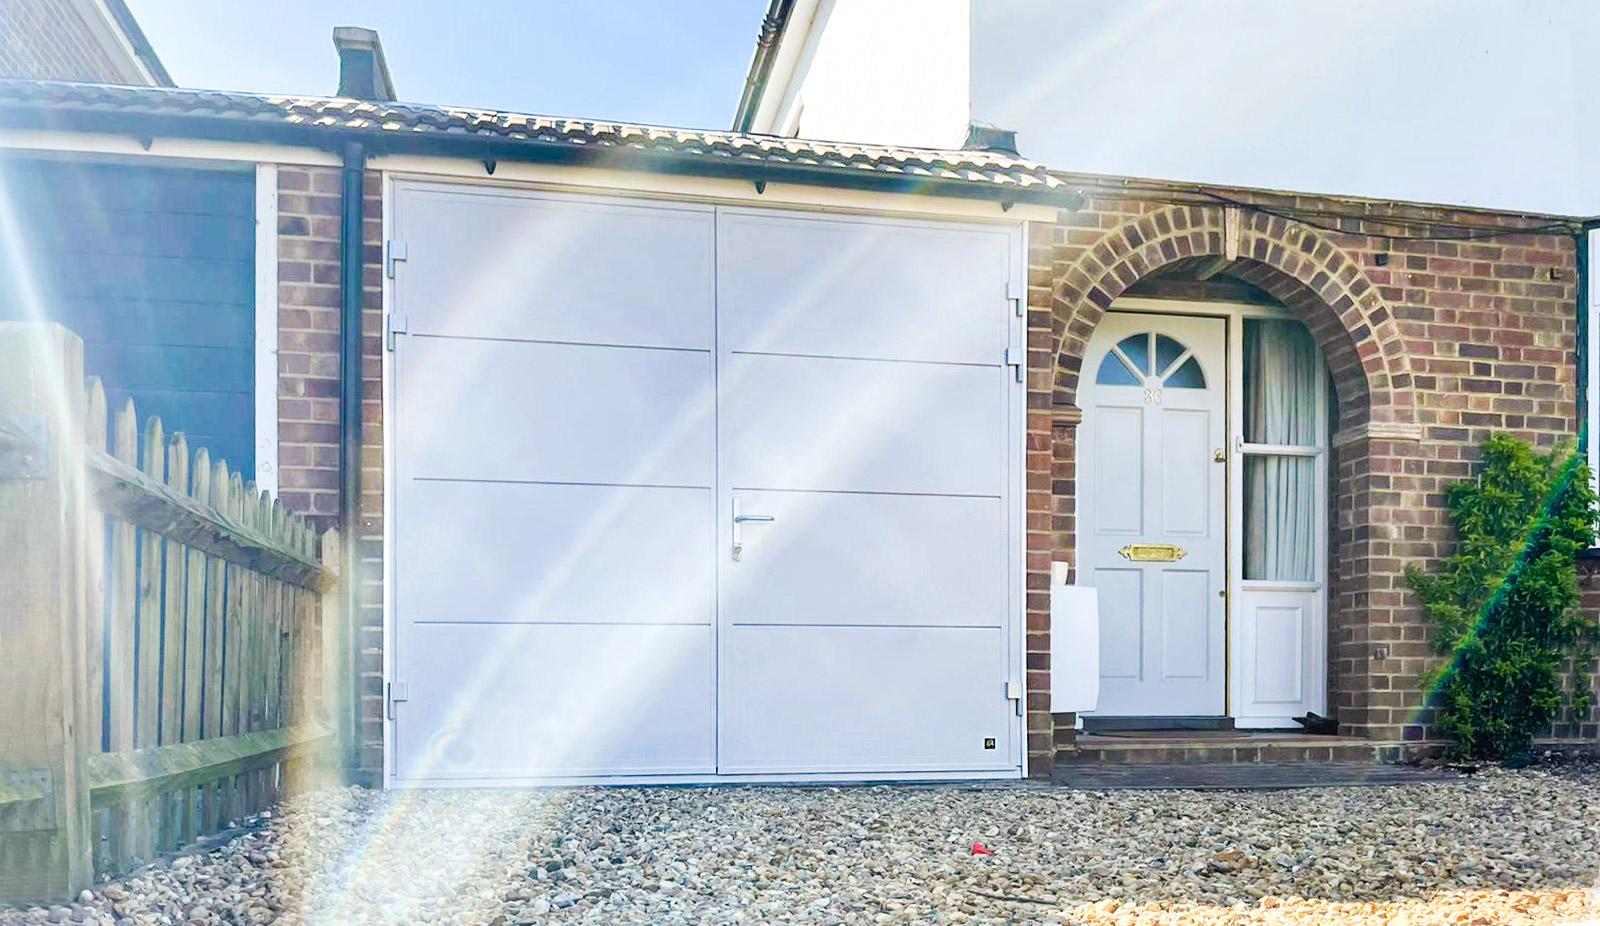 Ryterna Wide Horizontal Ribbed Insulated Side Hinged Garage Doors in Telegrey